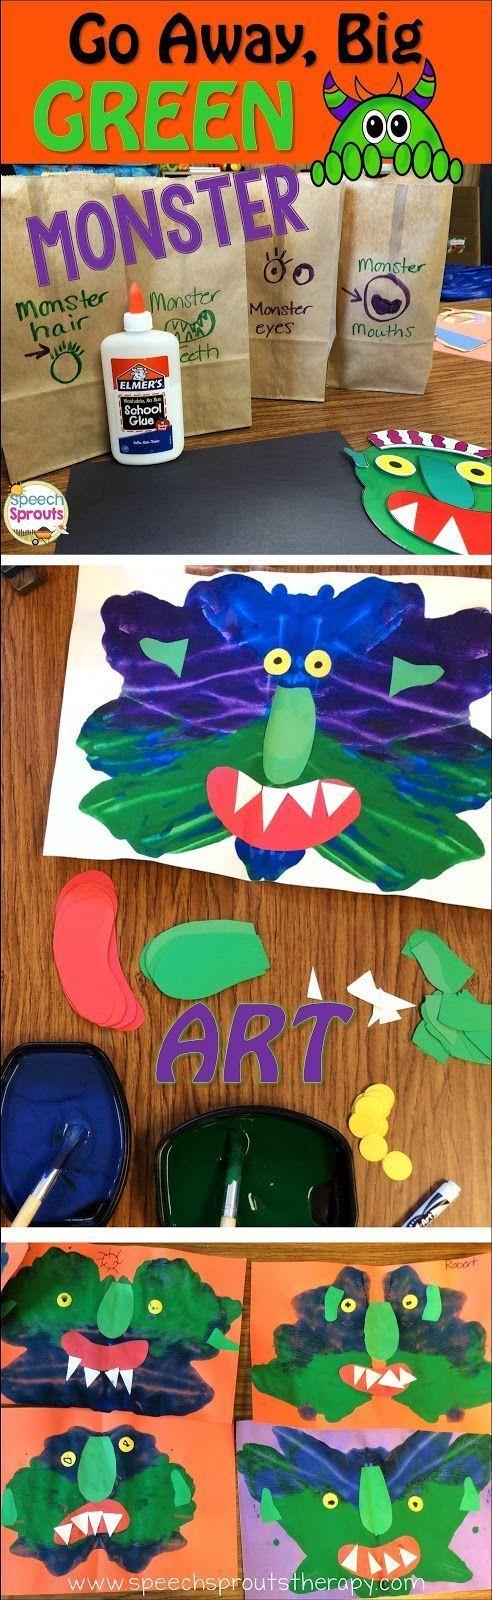 Go Away Big Green Monster: Best-Ever Books For Halloween Speech Therapy http://www.speechsproutstherapy.com